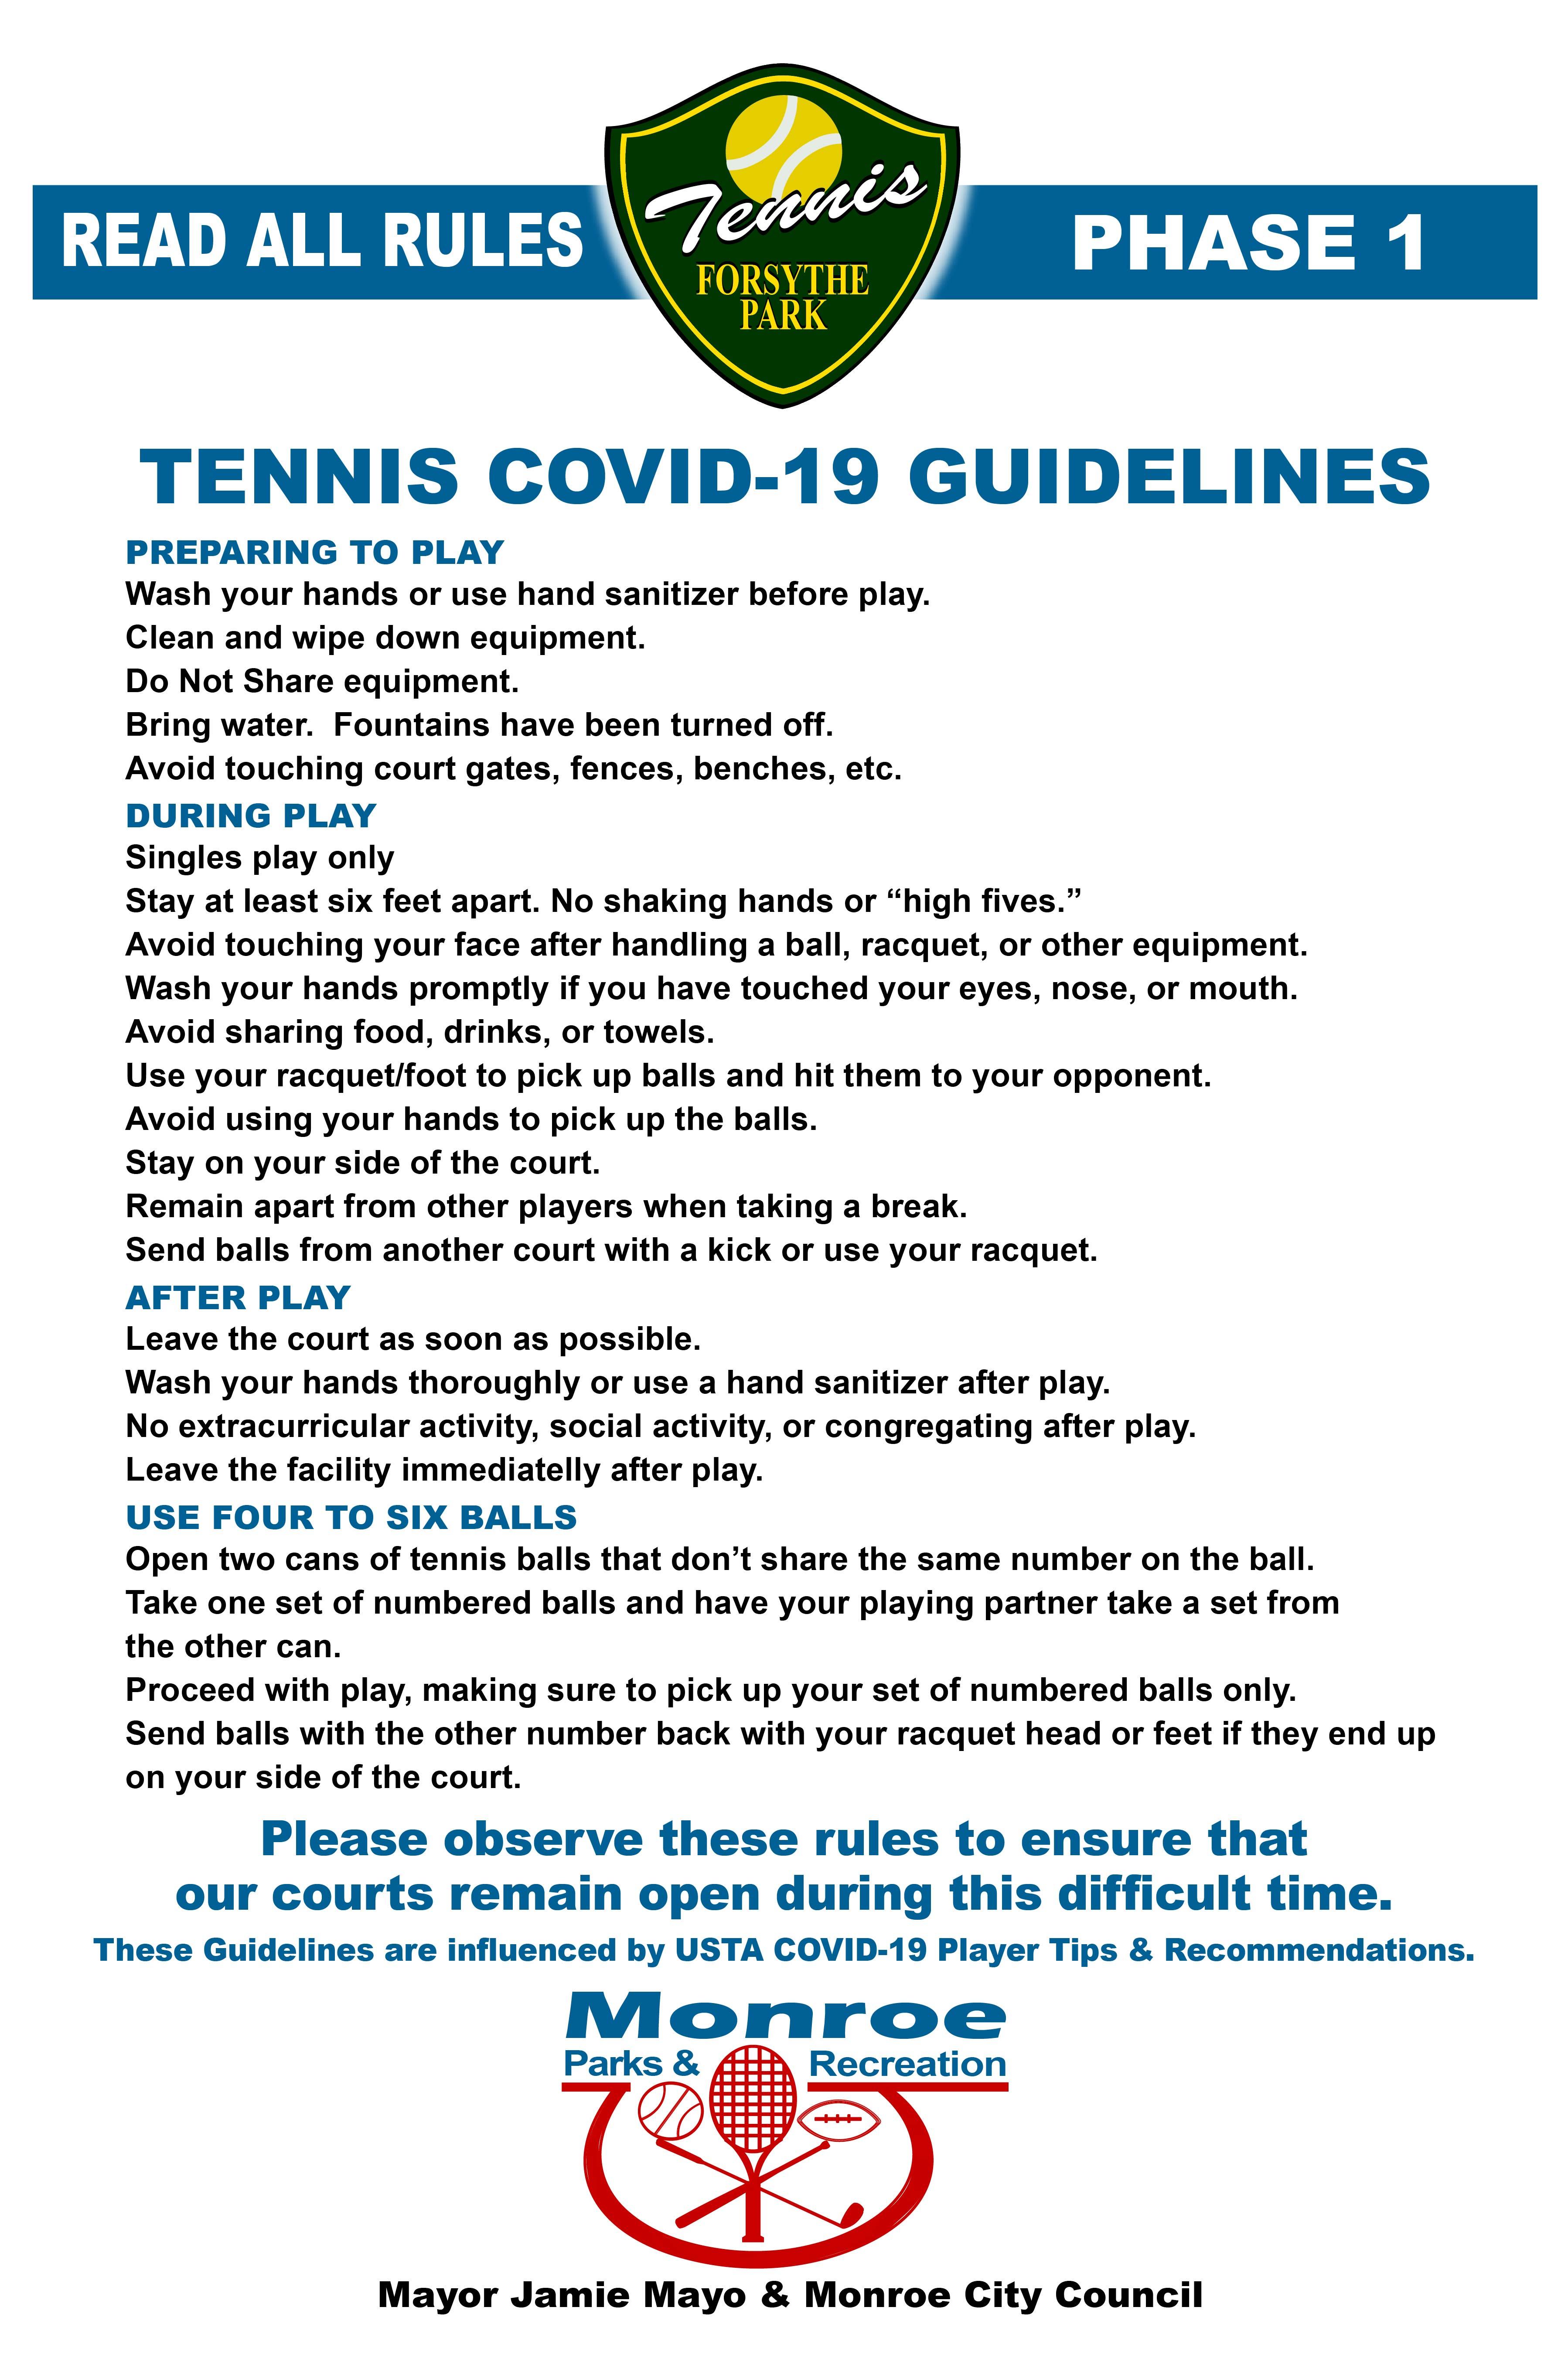 Phase 1 - Tennis